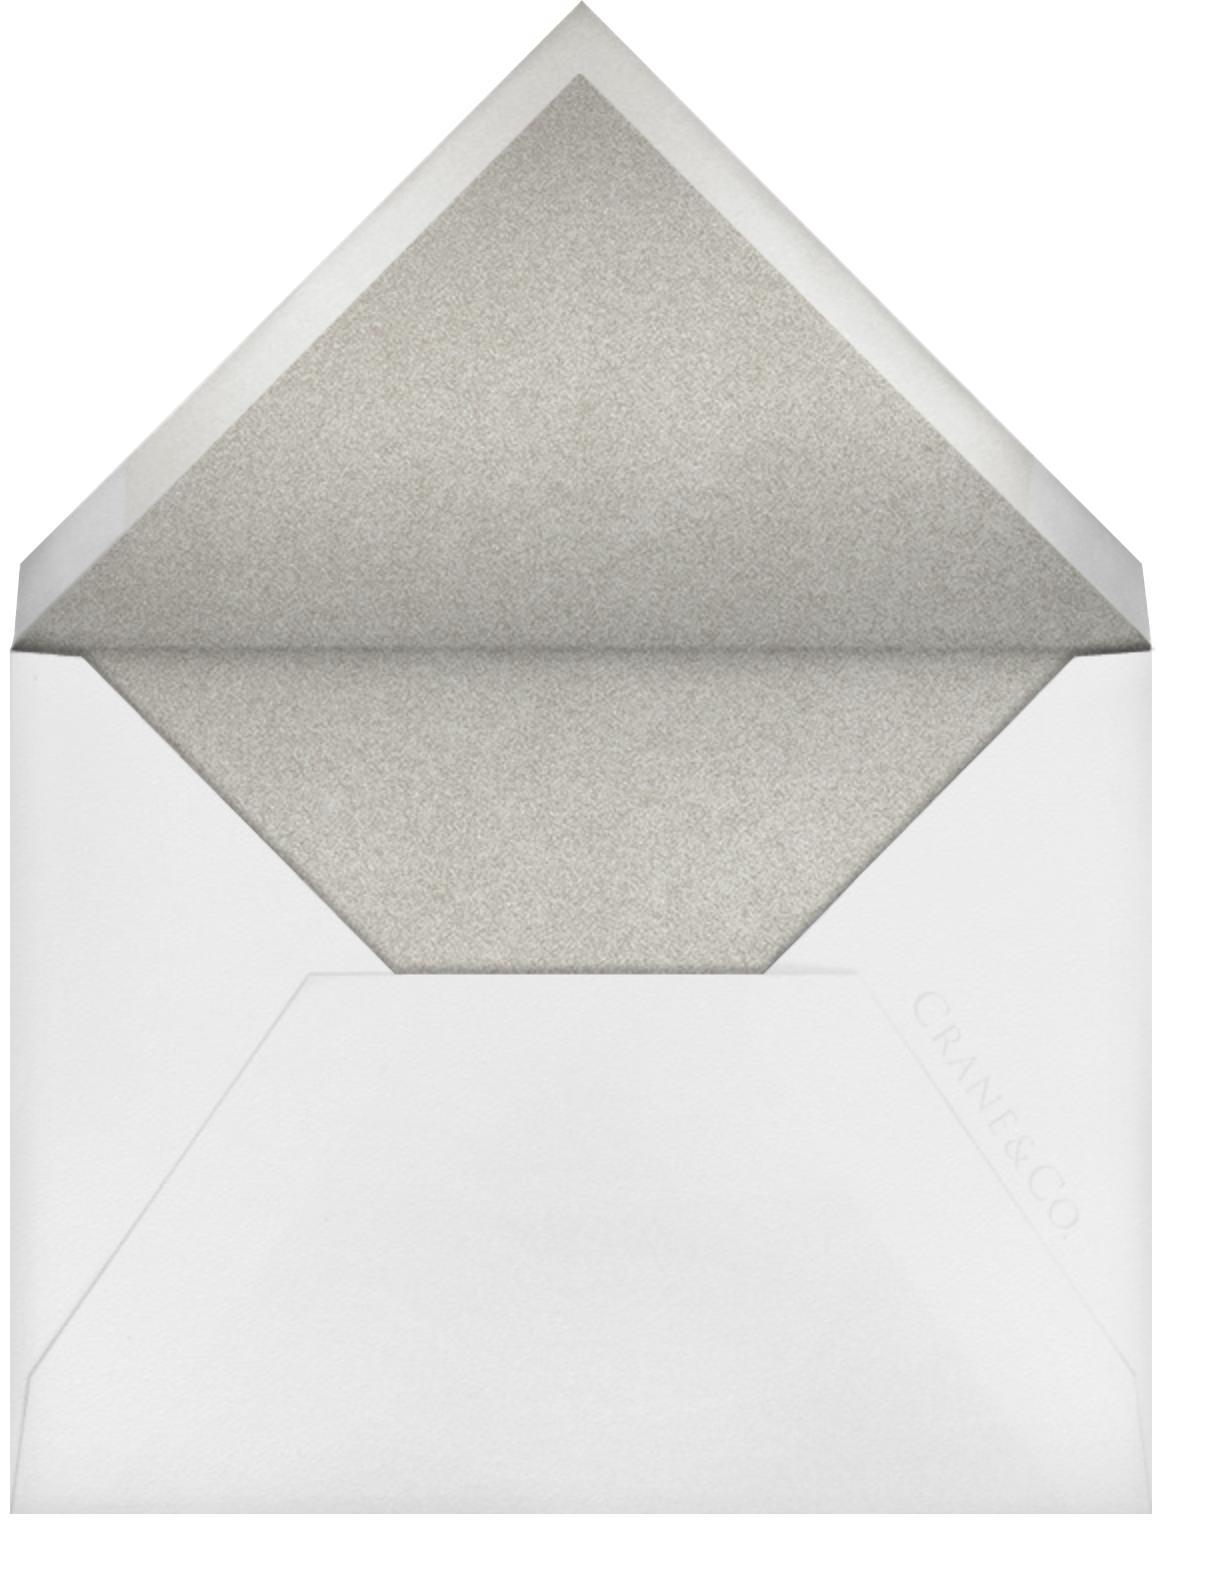 Vine Menorah - Platinum - Paperless Post - Hanukkah - envelope back